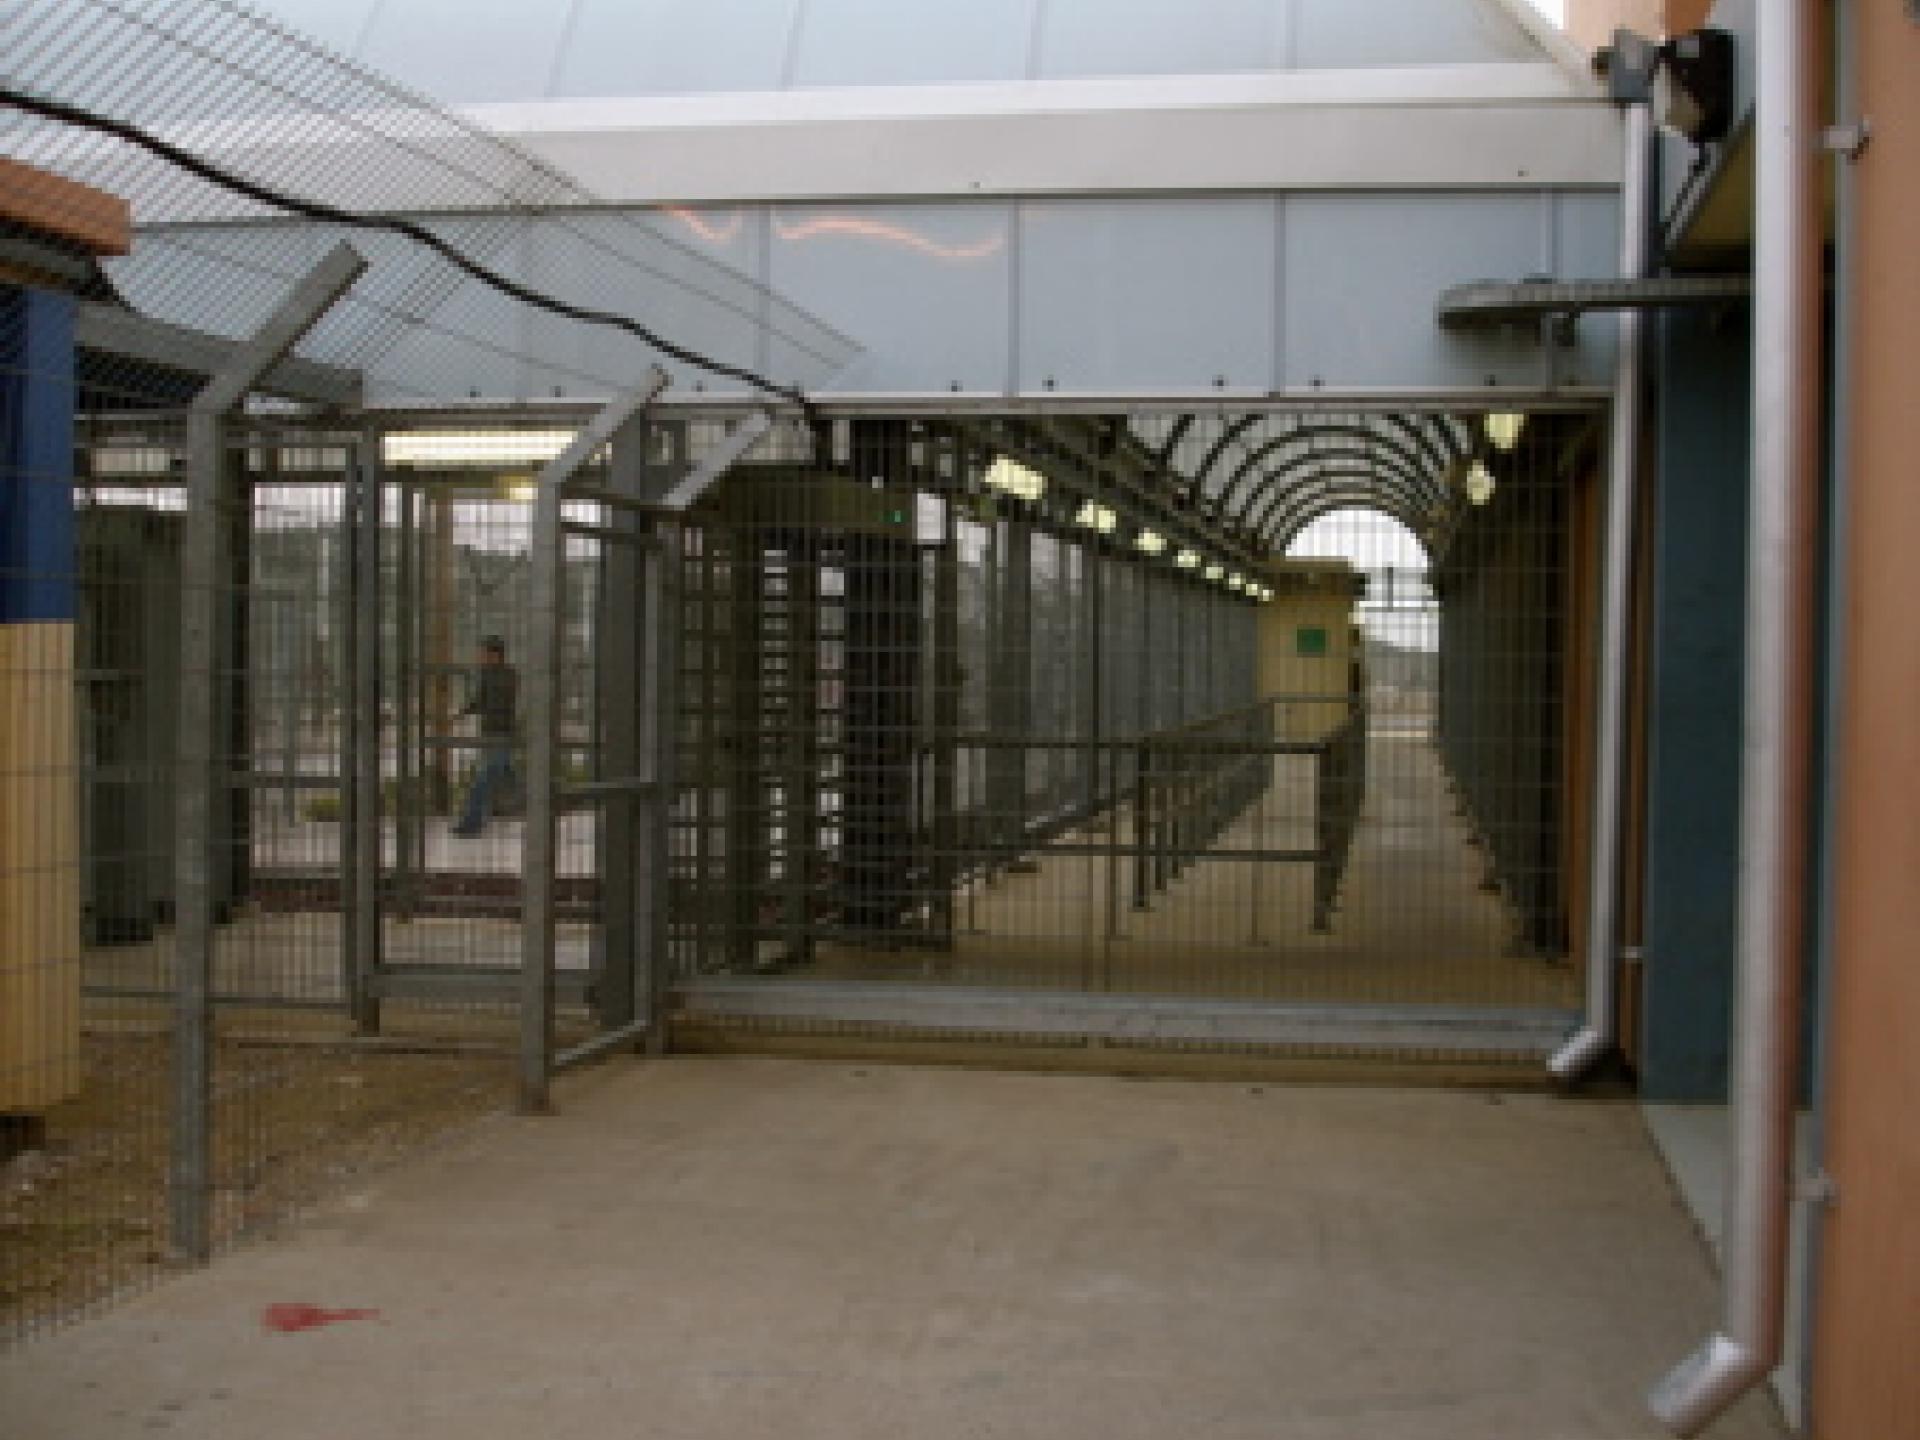 Barta'a/Reikhan checkpoint 22.03.07